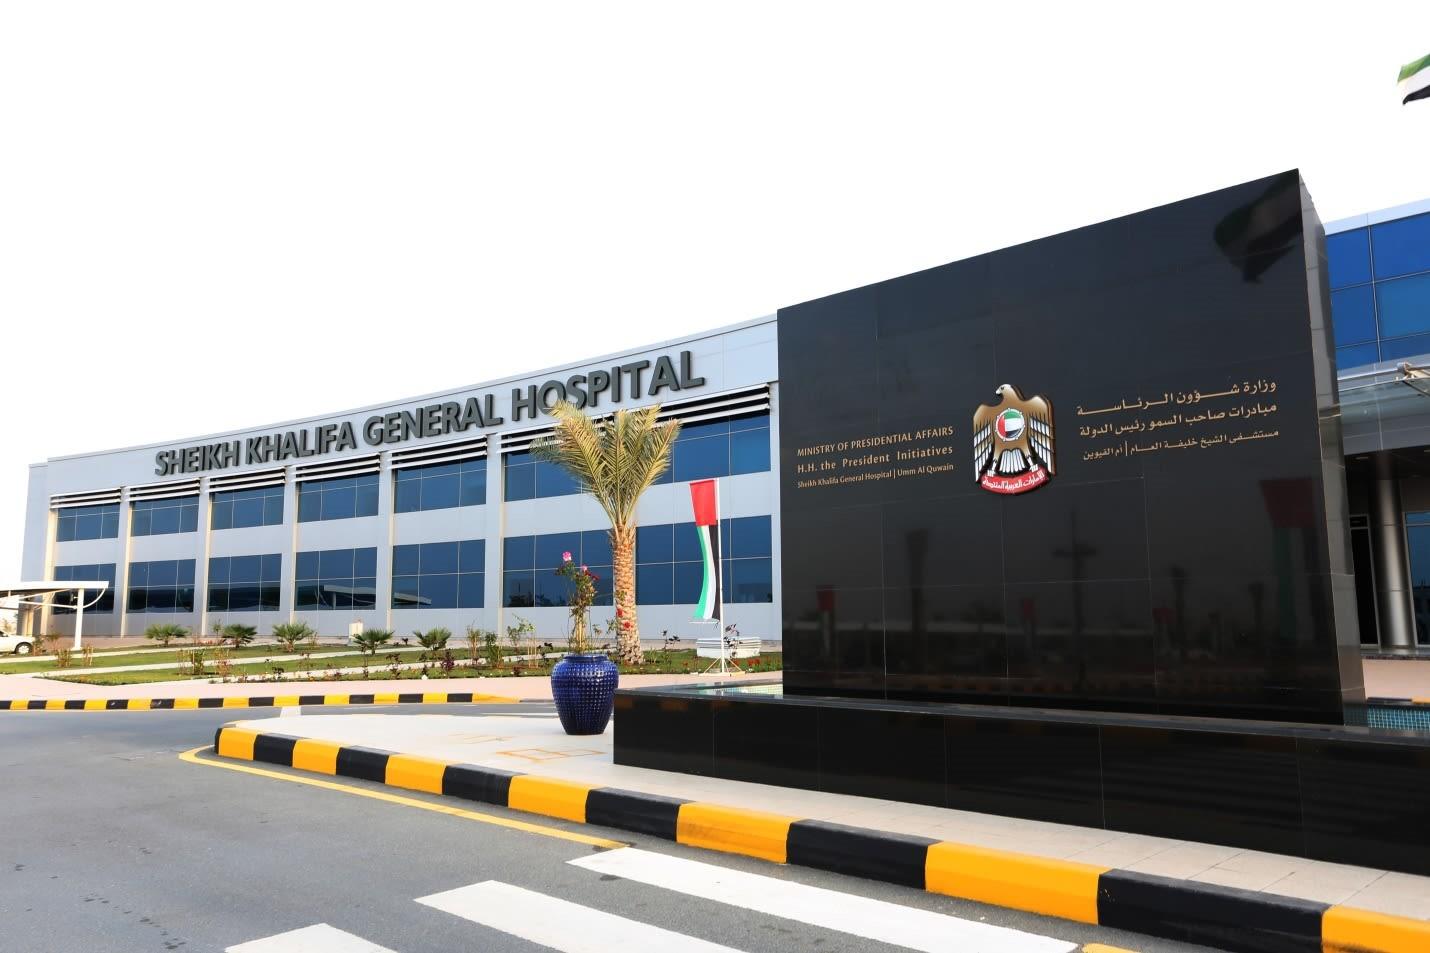 Industrial Automation - Umm Al Quwain Project